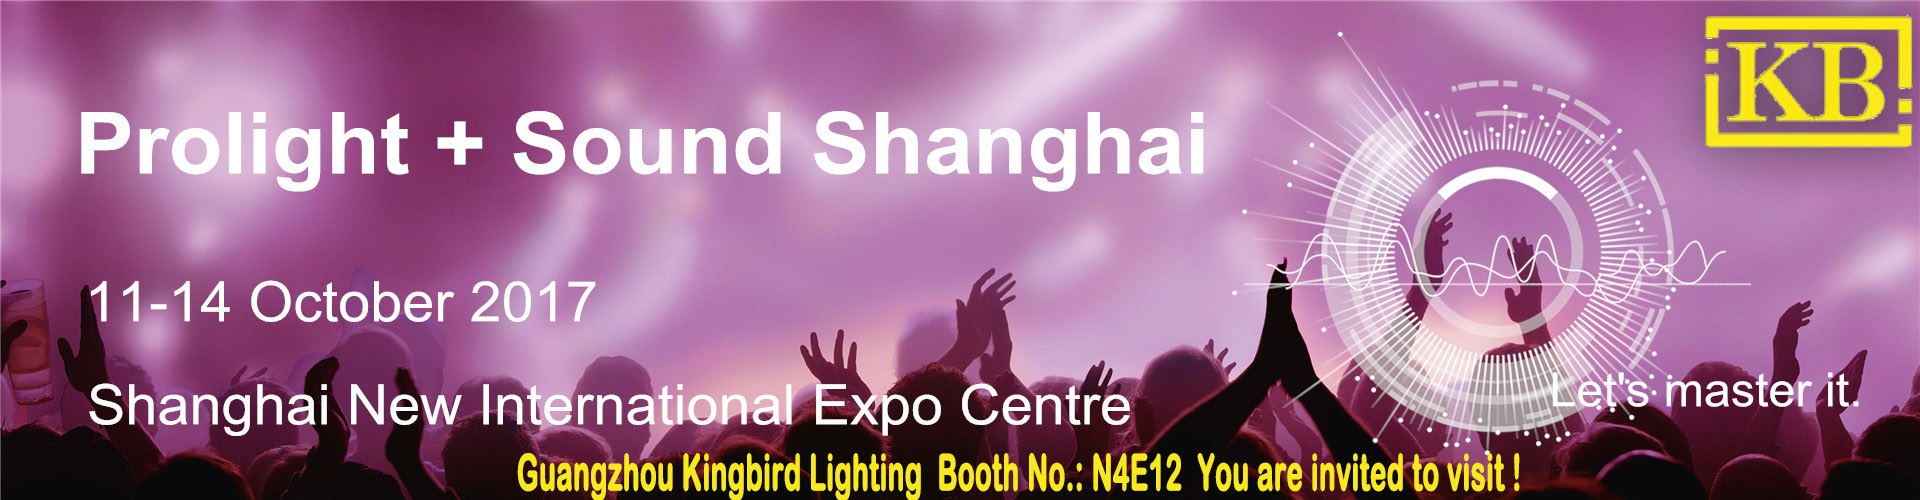 Prolight+sound Expo Shanghai 2017